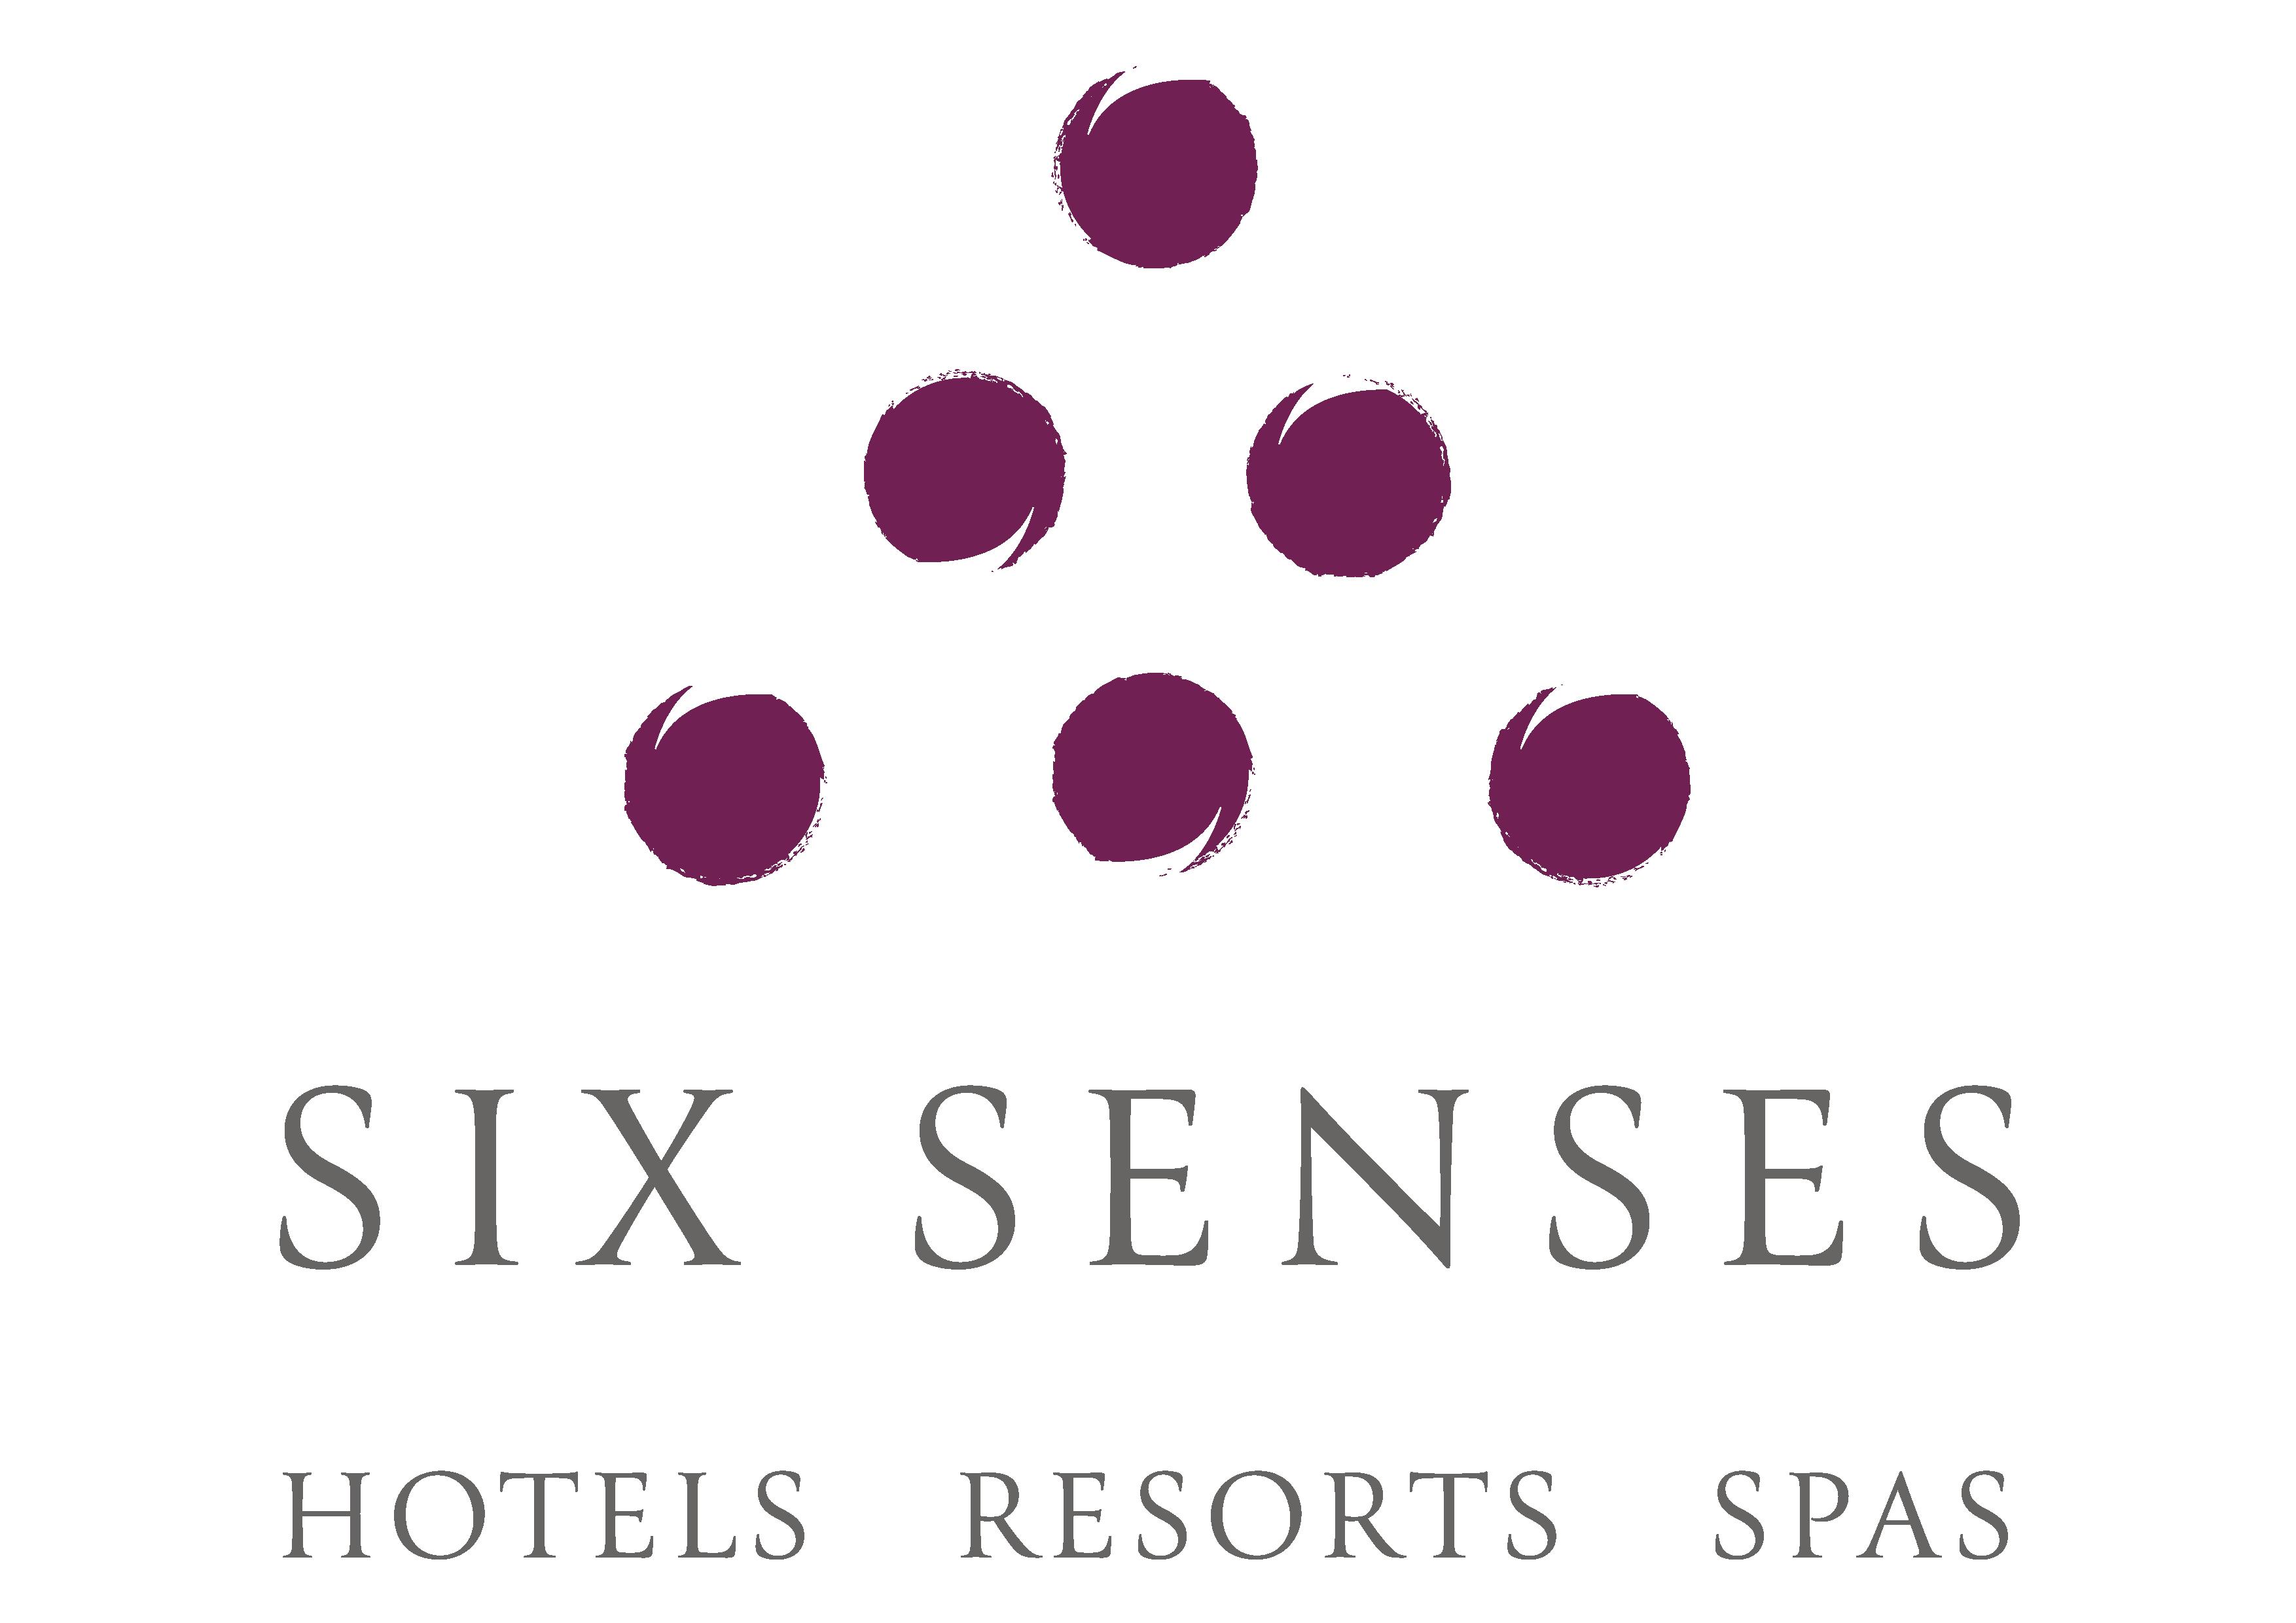 SS_BRAND_standard_logo